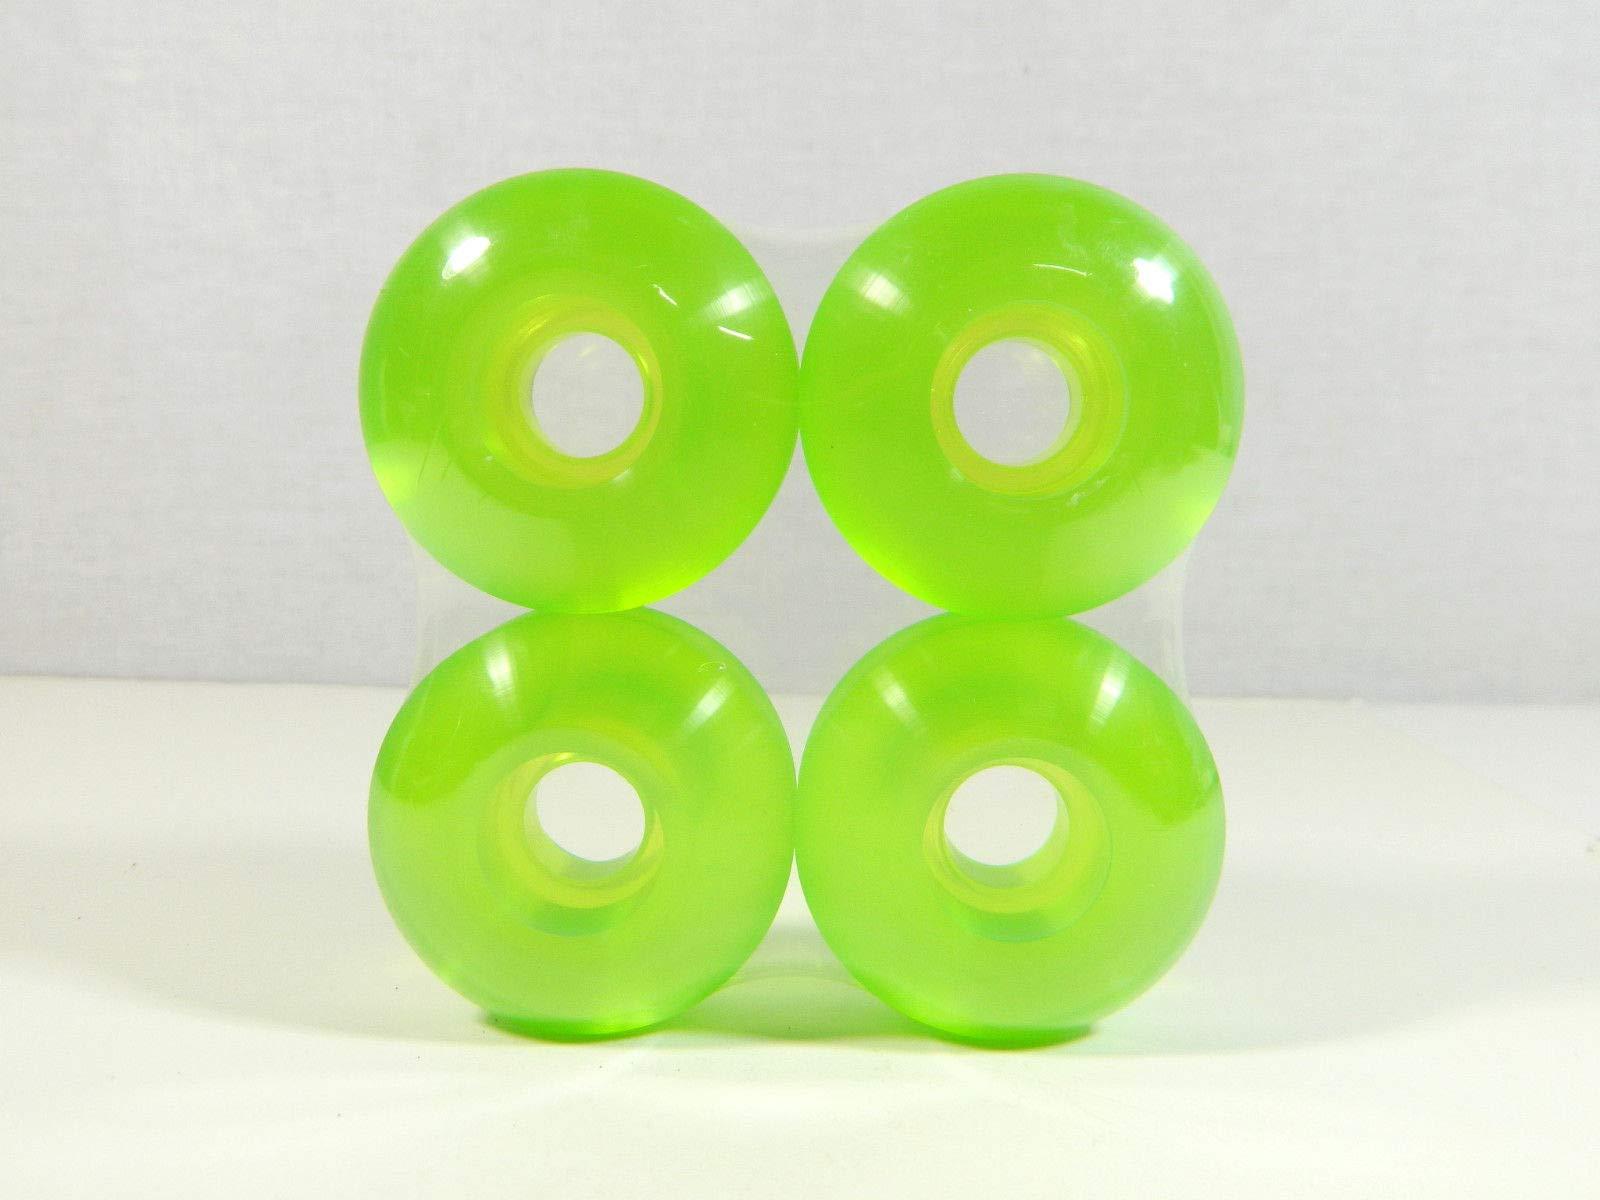 Clear Green Blank 52Mm X 31Mm Pro Skateboard Wheels Multi Clear Color Sealed